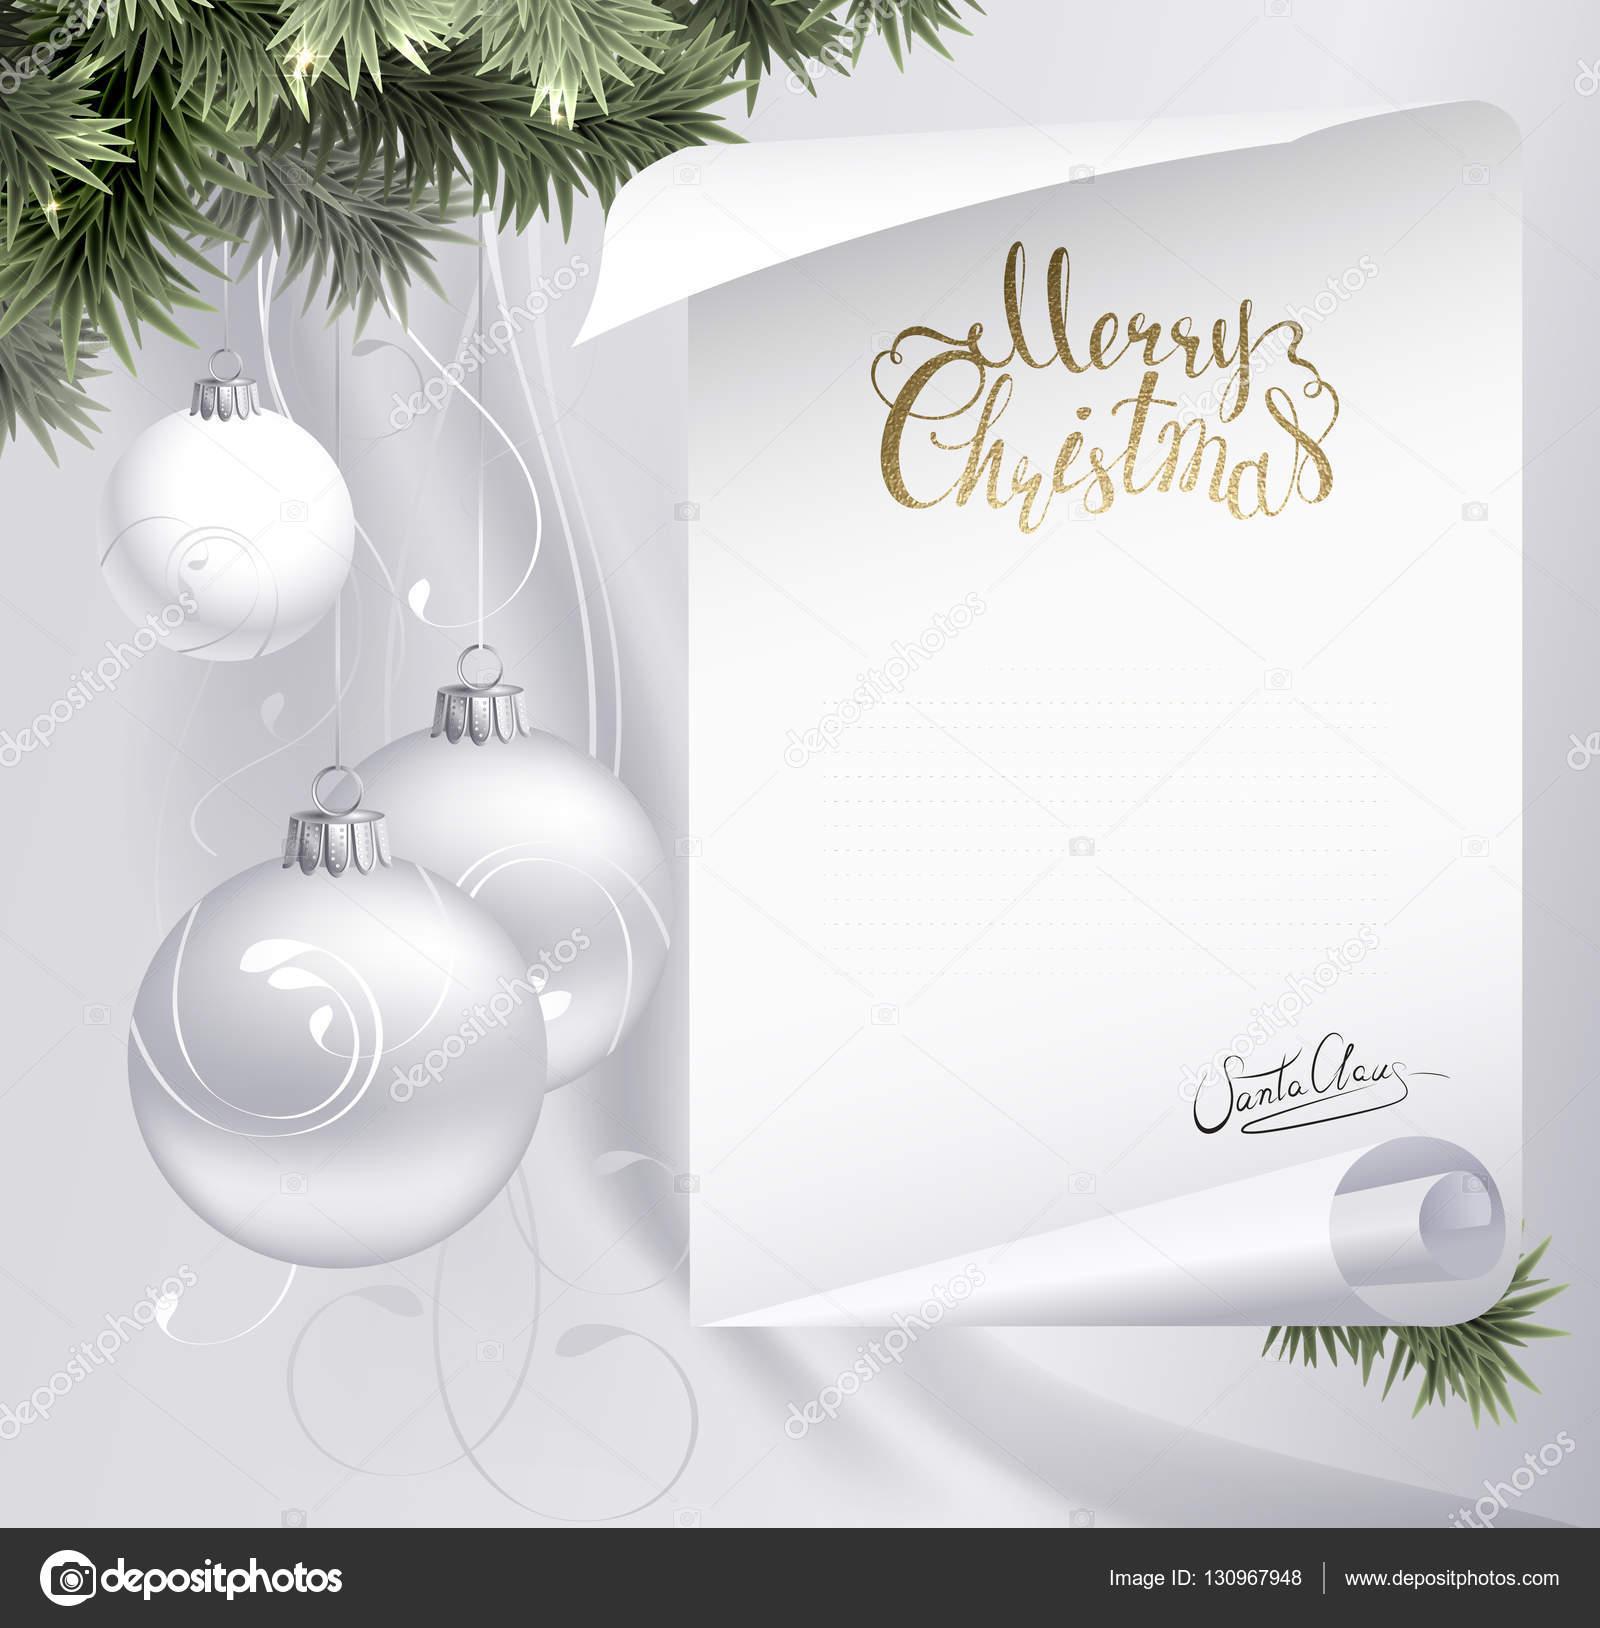 Auguri Di Buon Natale Eleganti.Cartolina D Auguri Di Natale Elegante Festa Vettoriali Stock